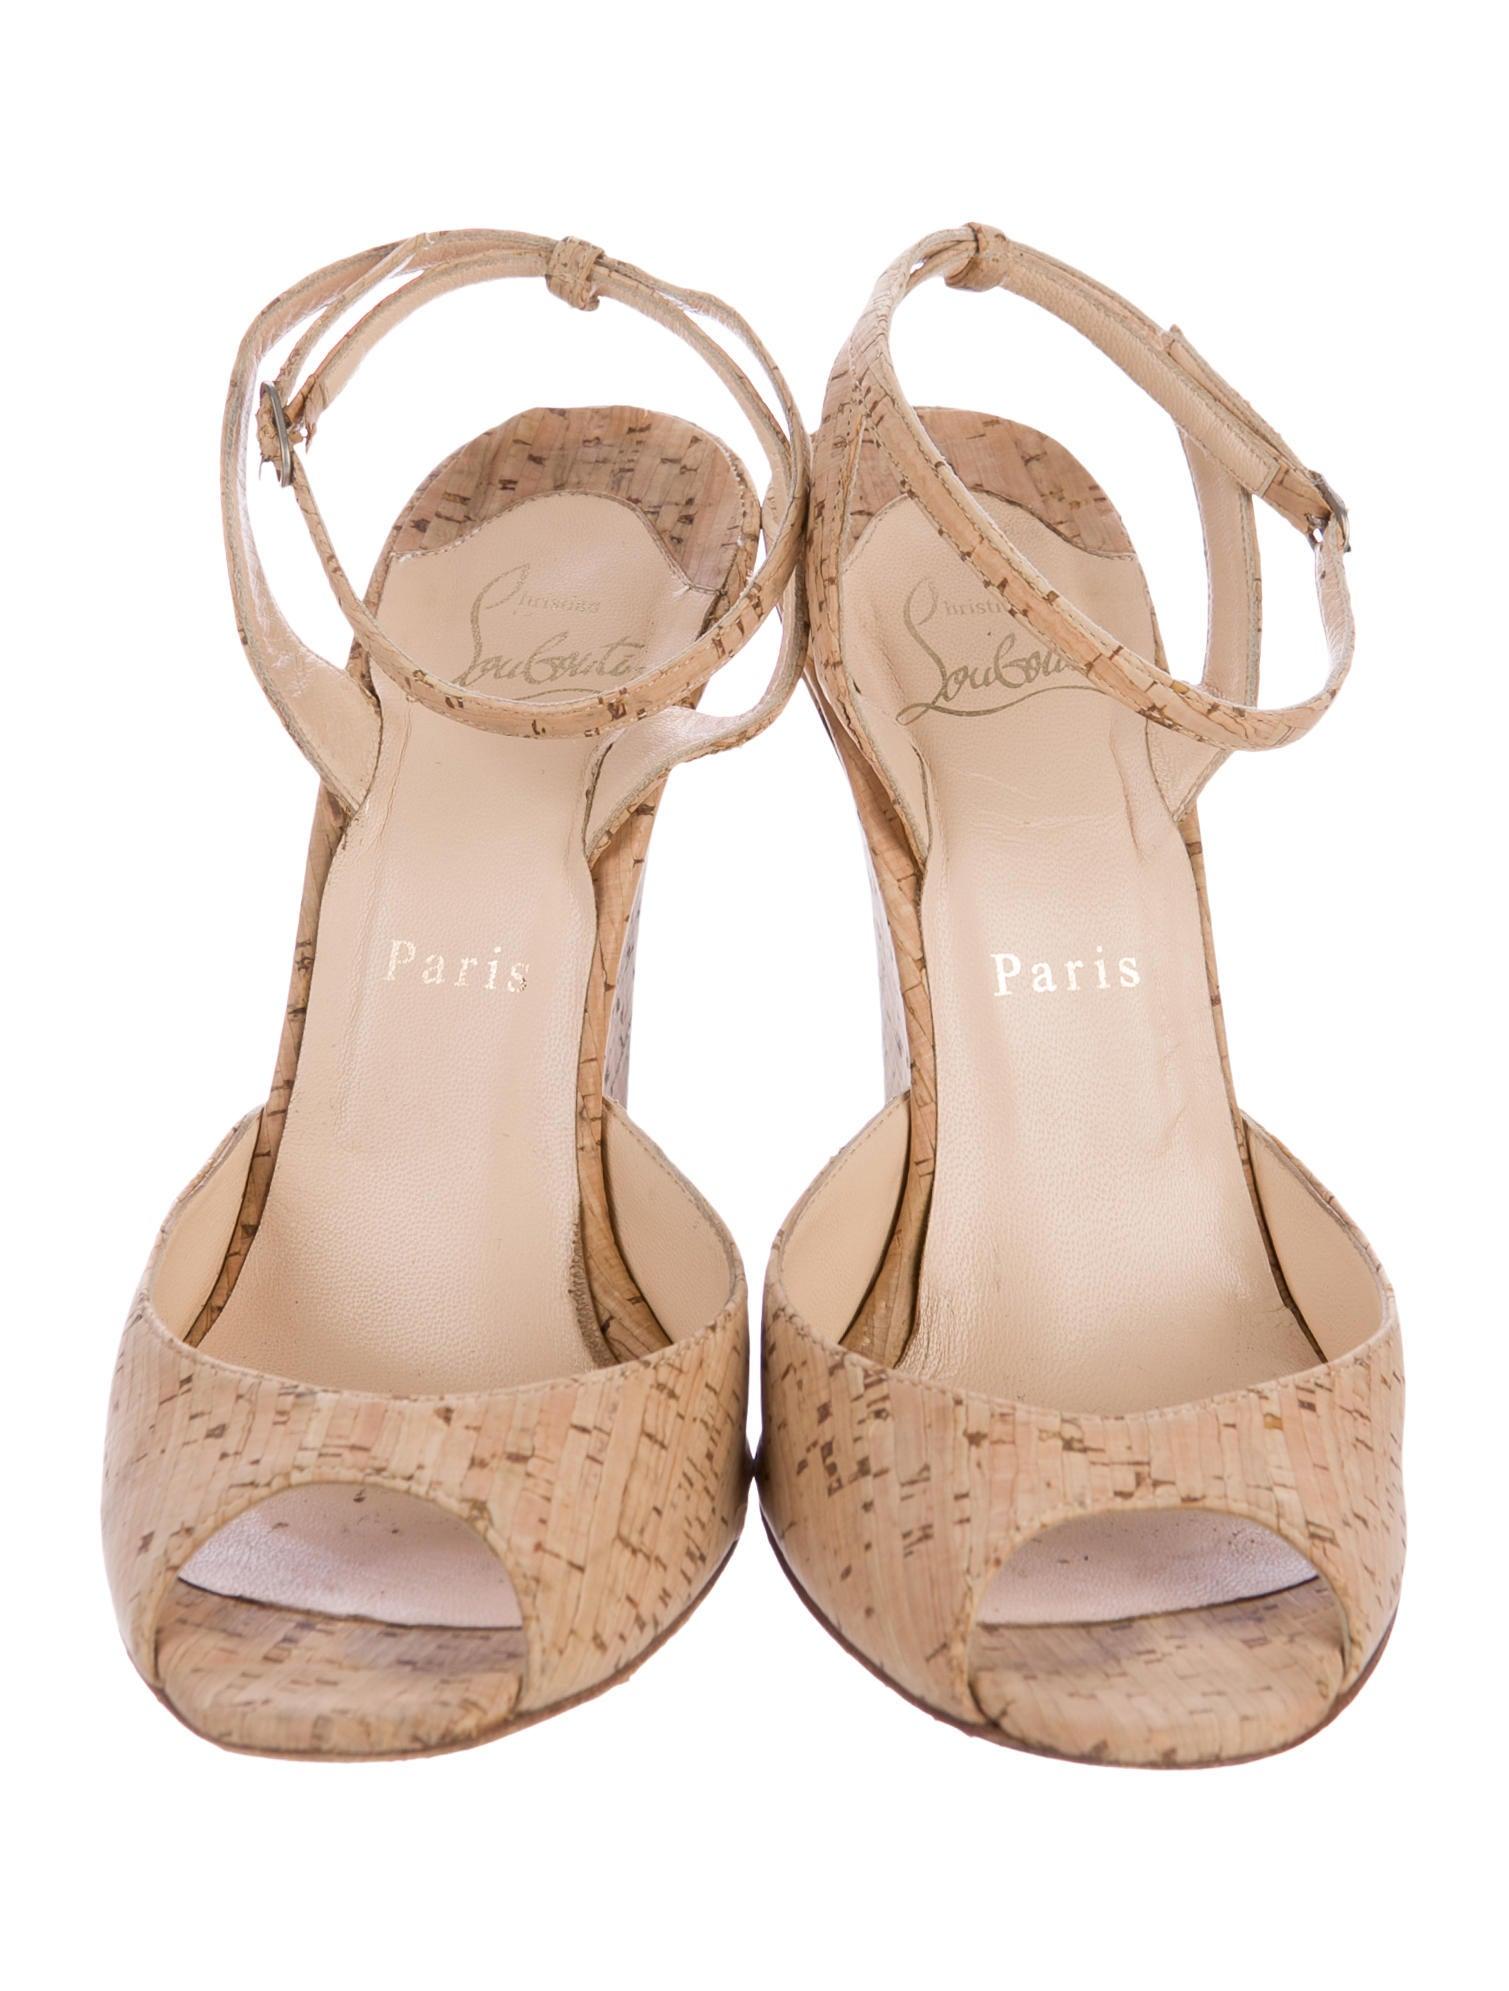 Christian Louboutin Cork Peep Toe Wedge Sandals Shoes